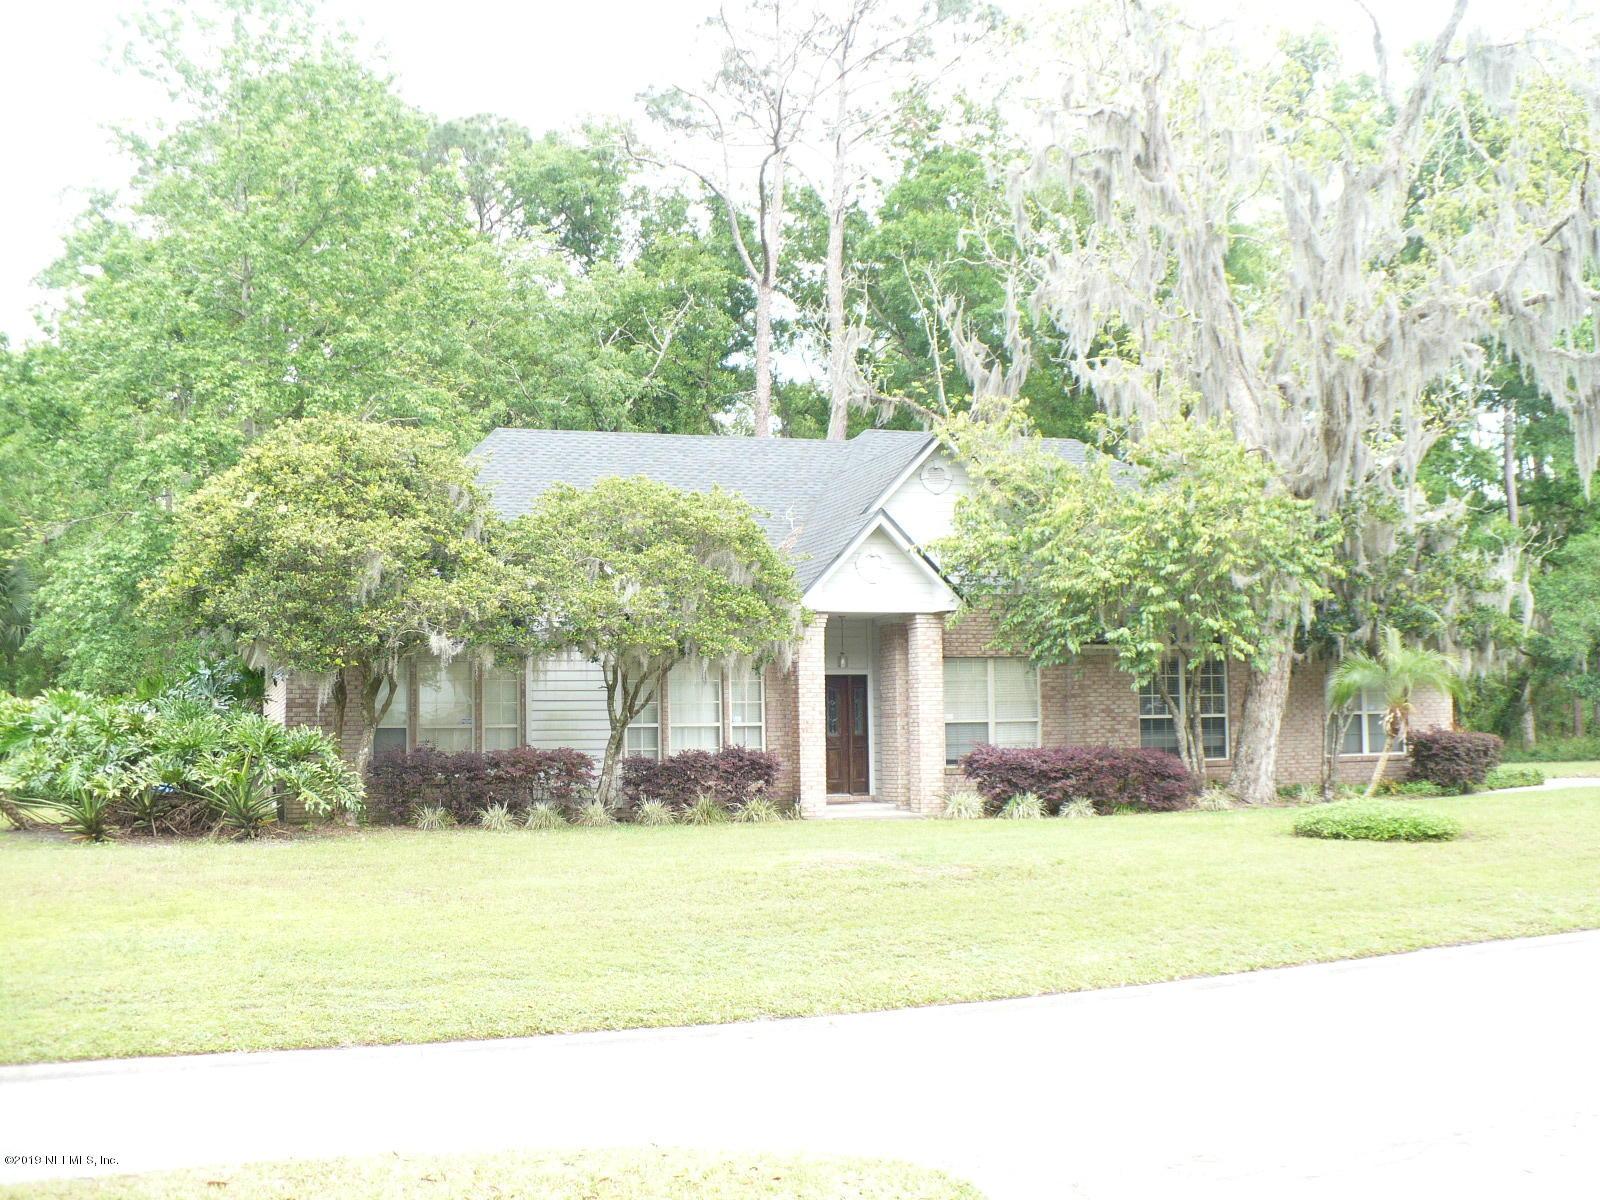 Photo of 12037 CRANEFOOT, JACKSONVILLE, FL 32223